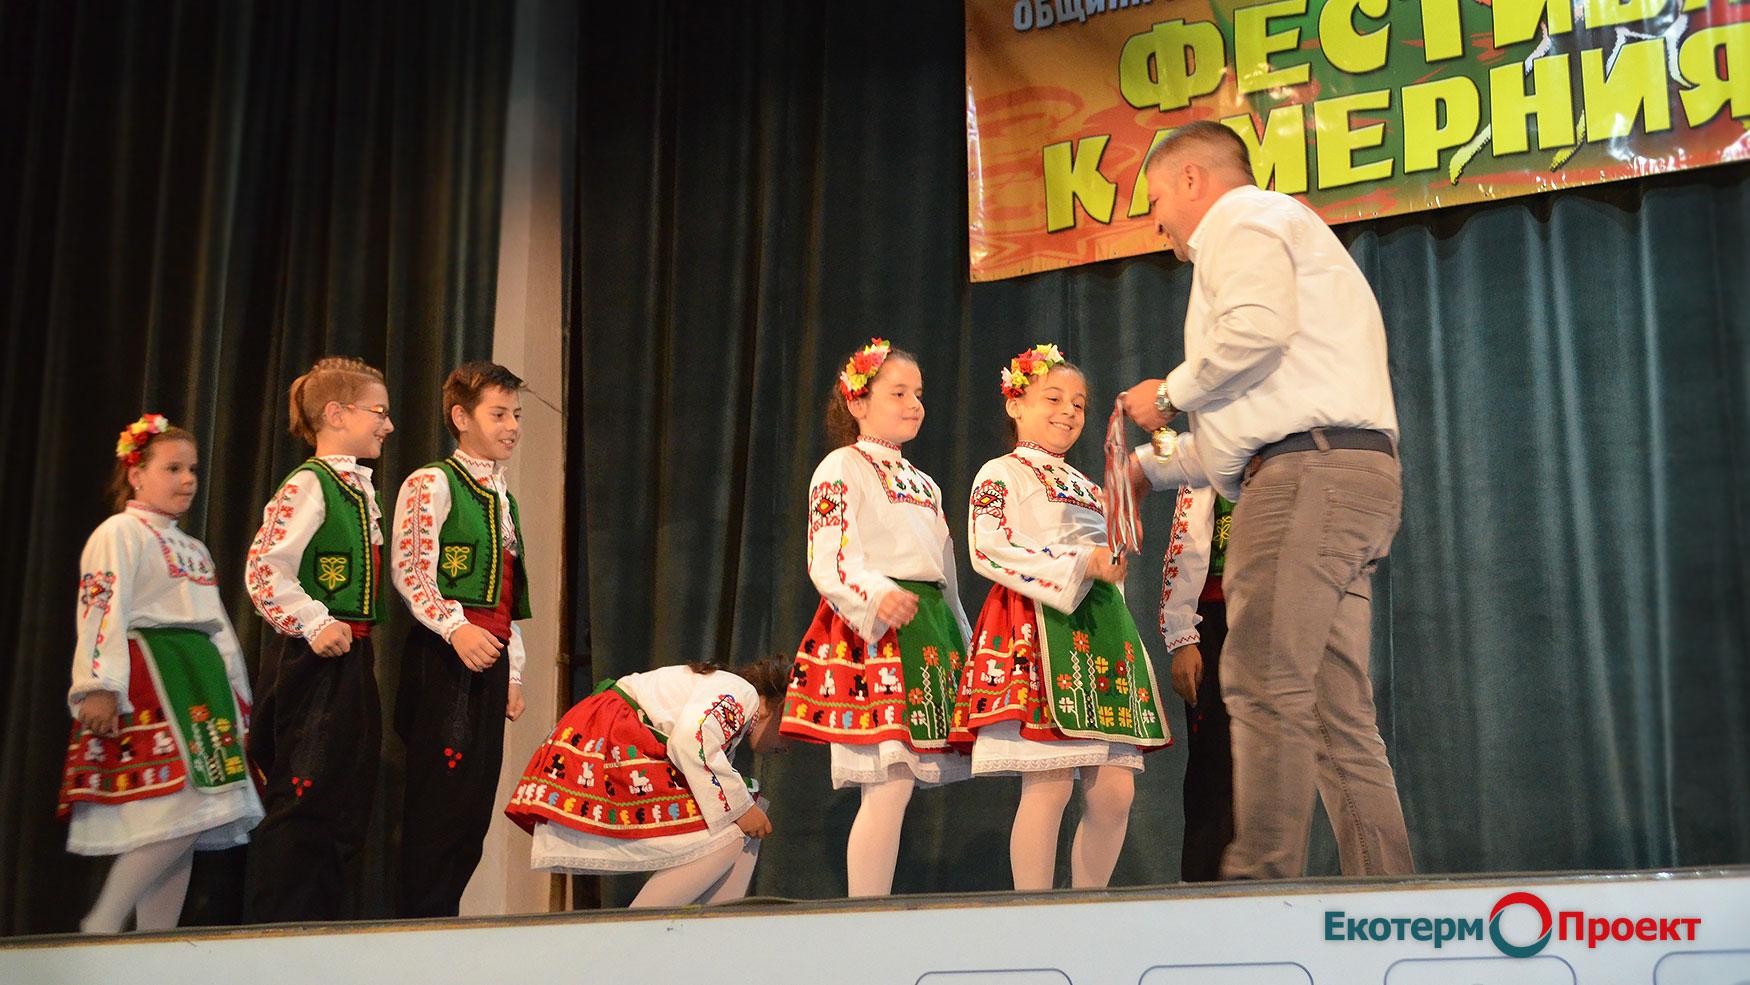 Ekoterm-Proekt-dance-donation-03_04-2019-c